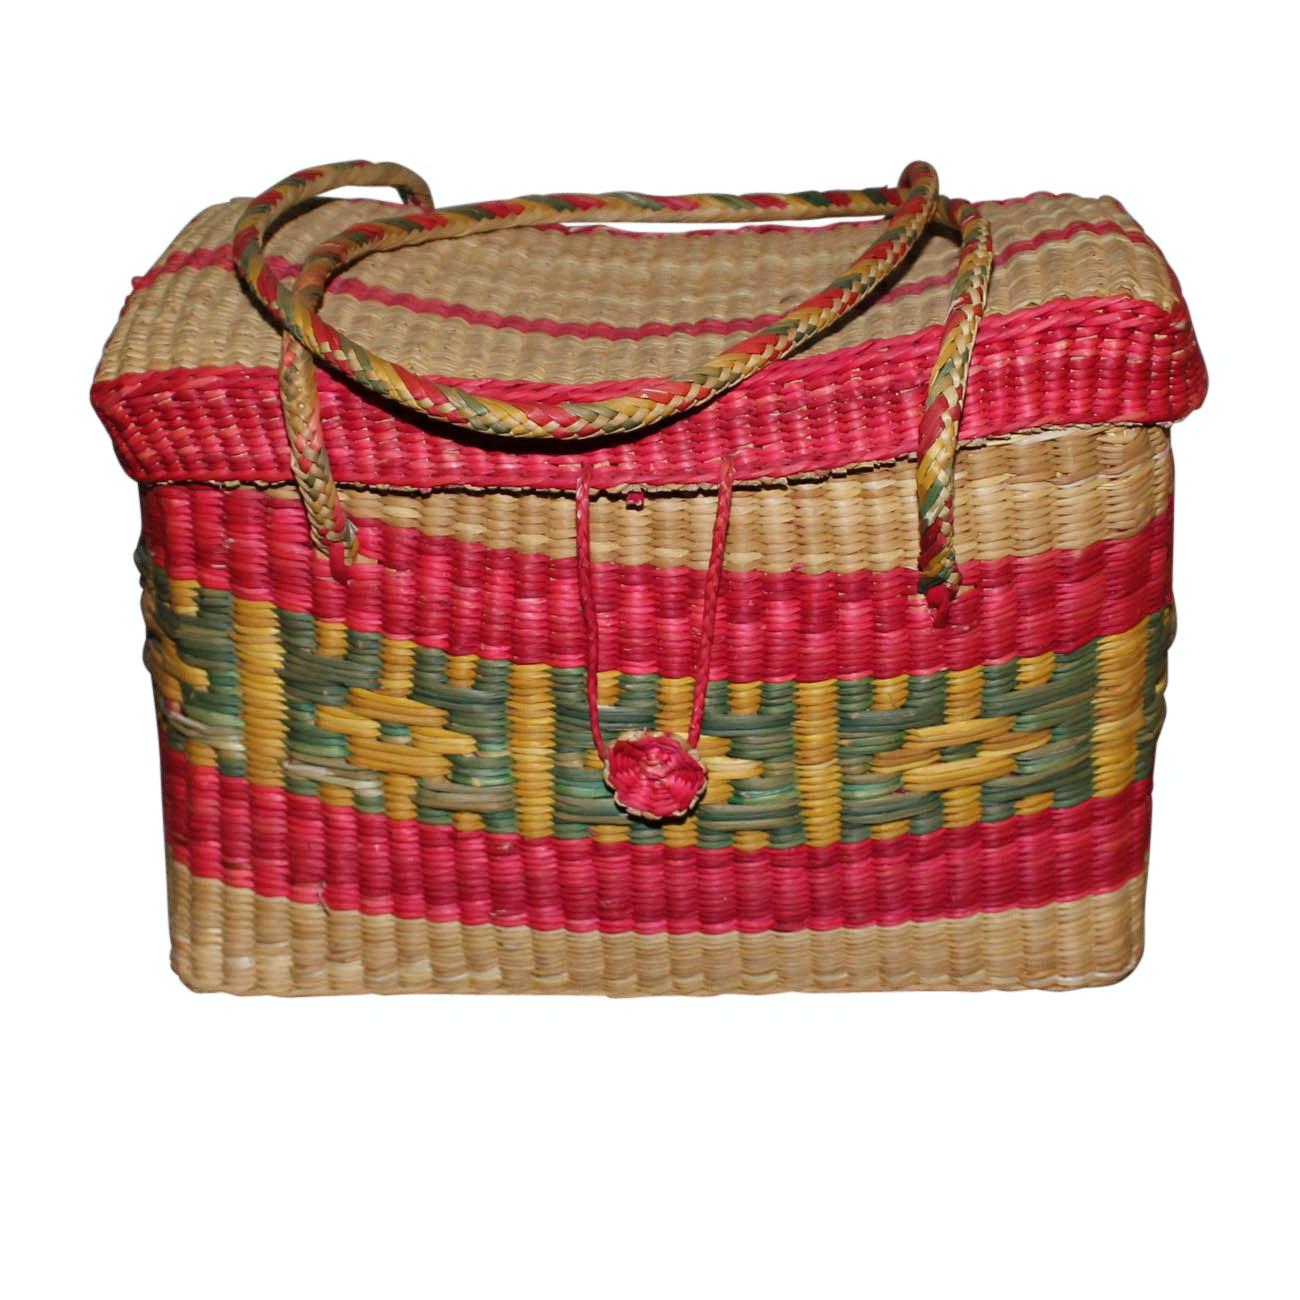 Colorful Handwoven Basket